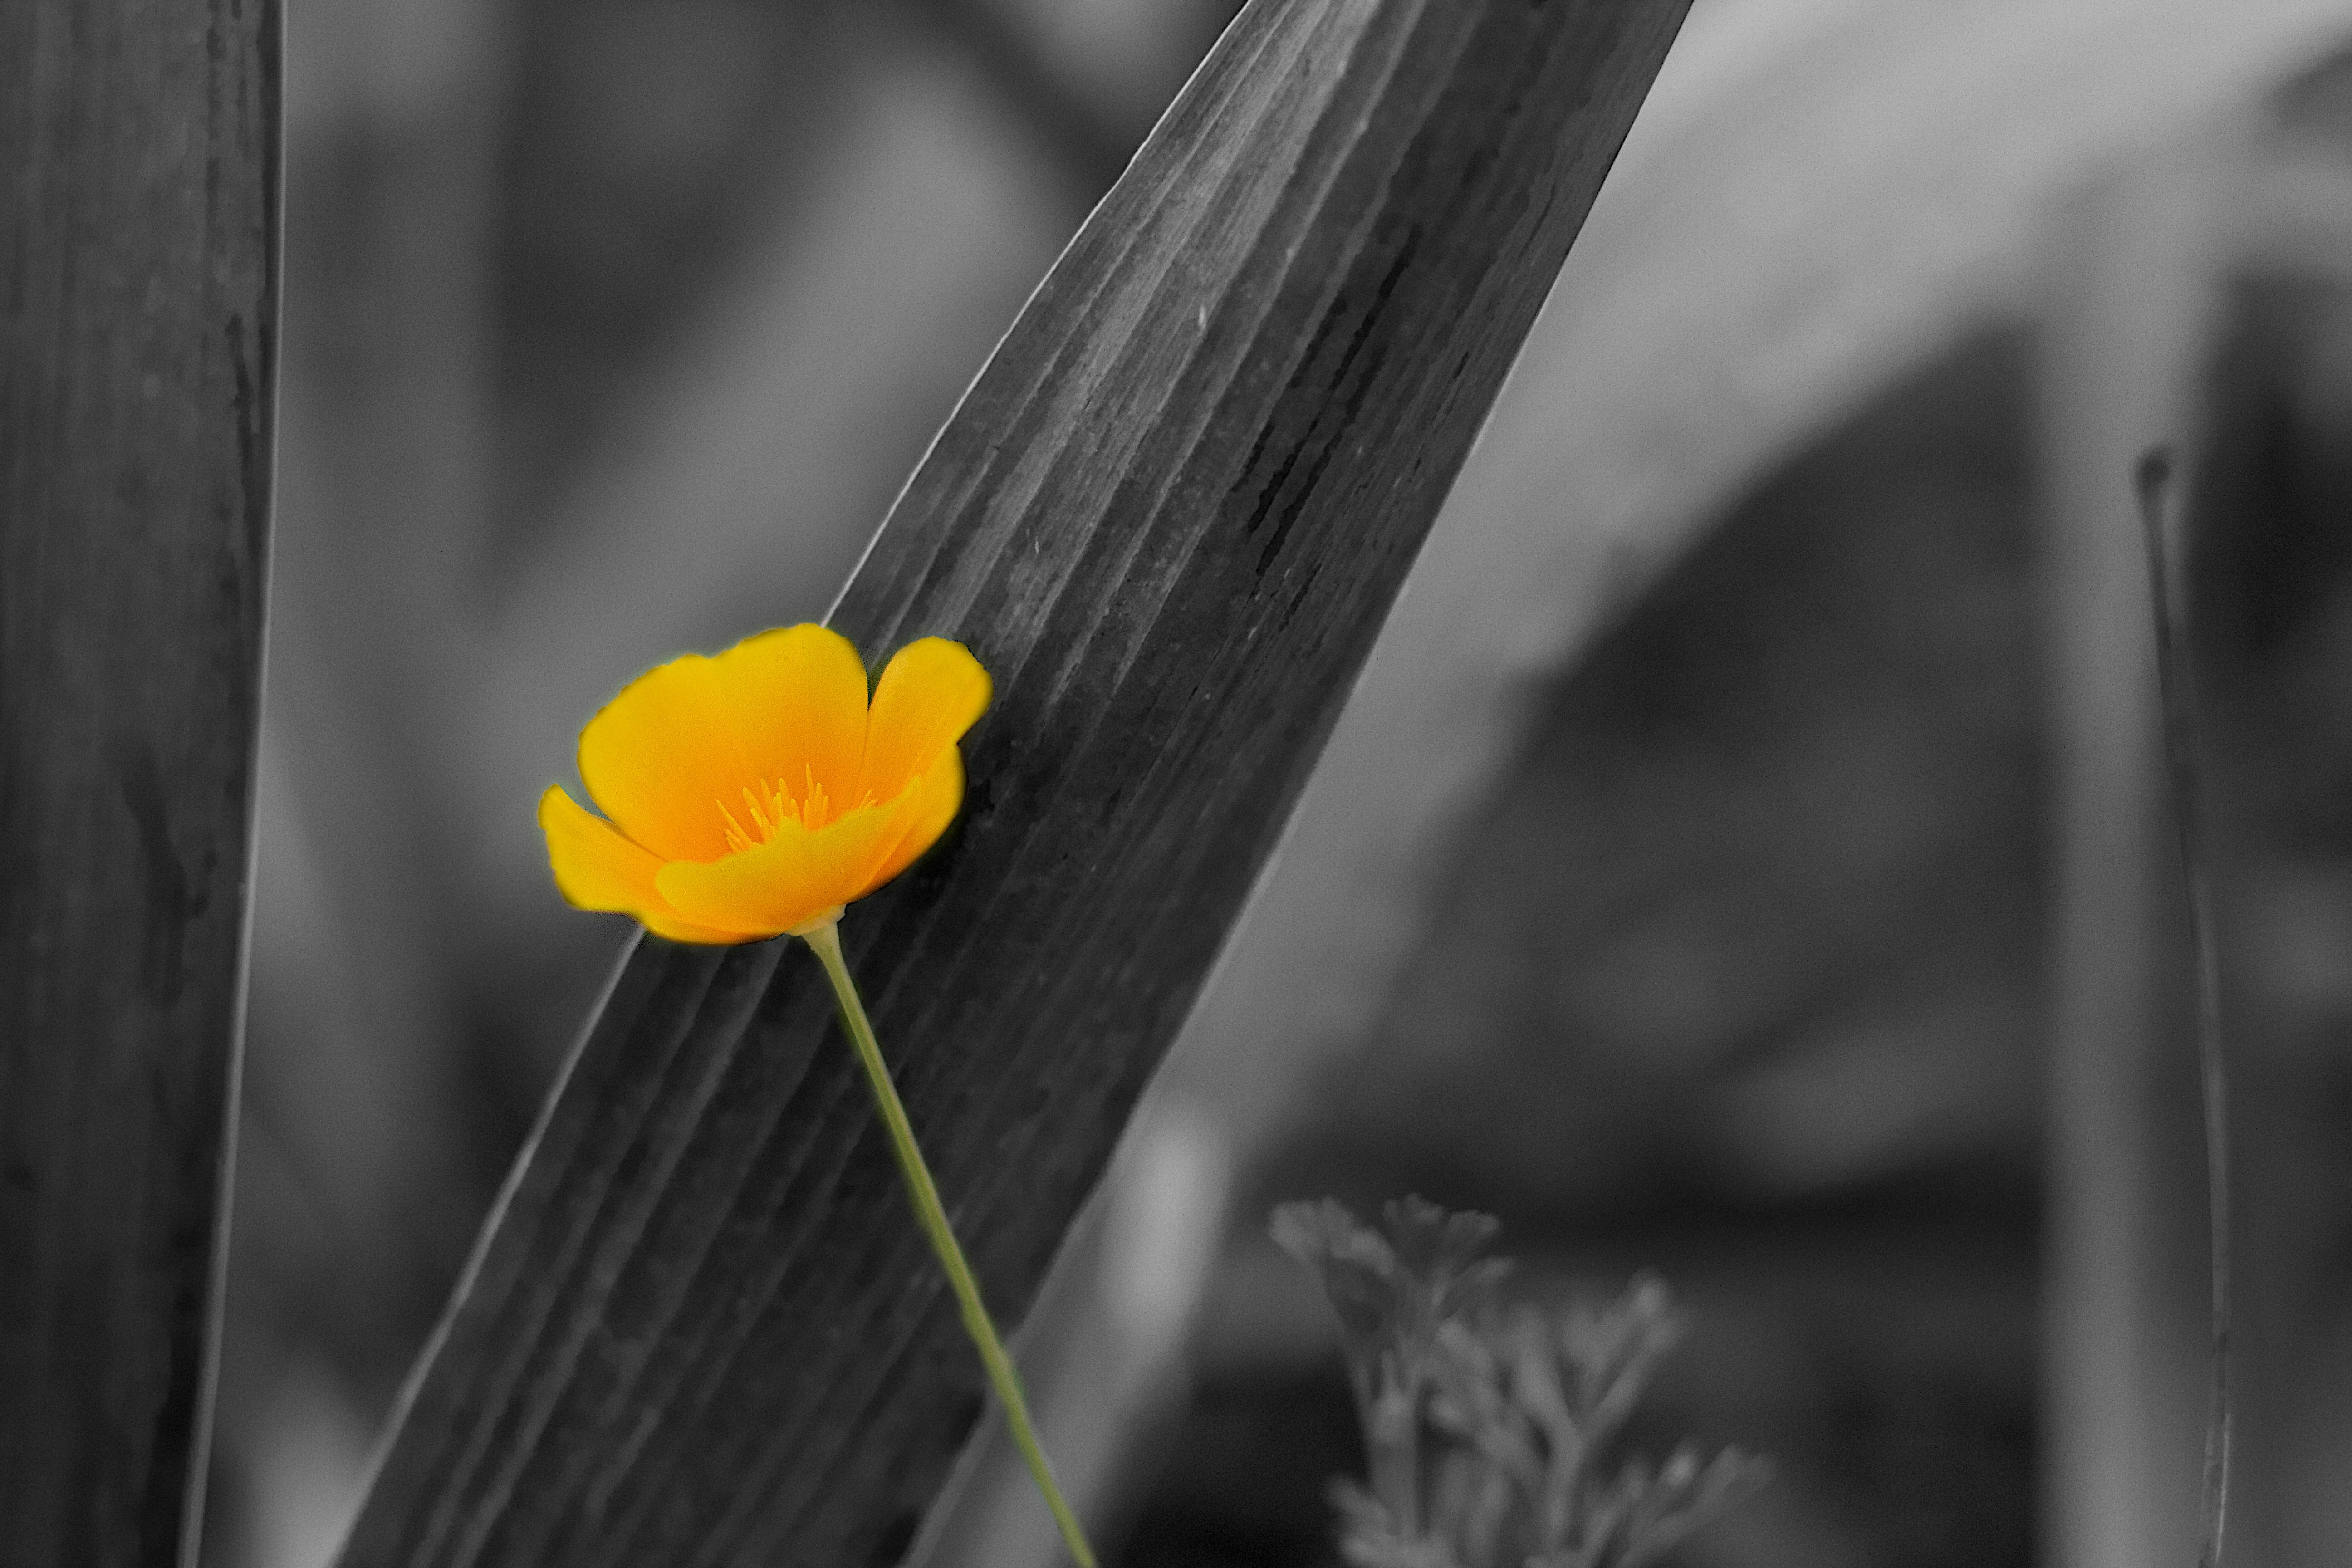 Nature Black And White Plant Photography Sunlight Leaf Flower Petal Yellow Monochrome Flora Close